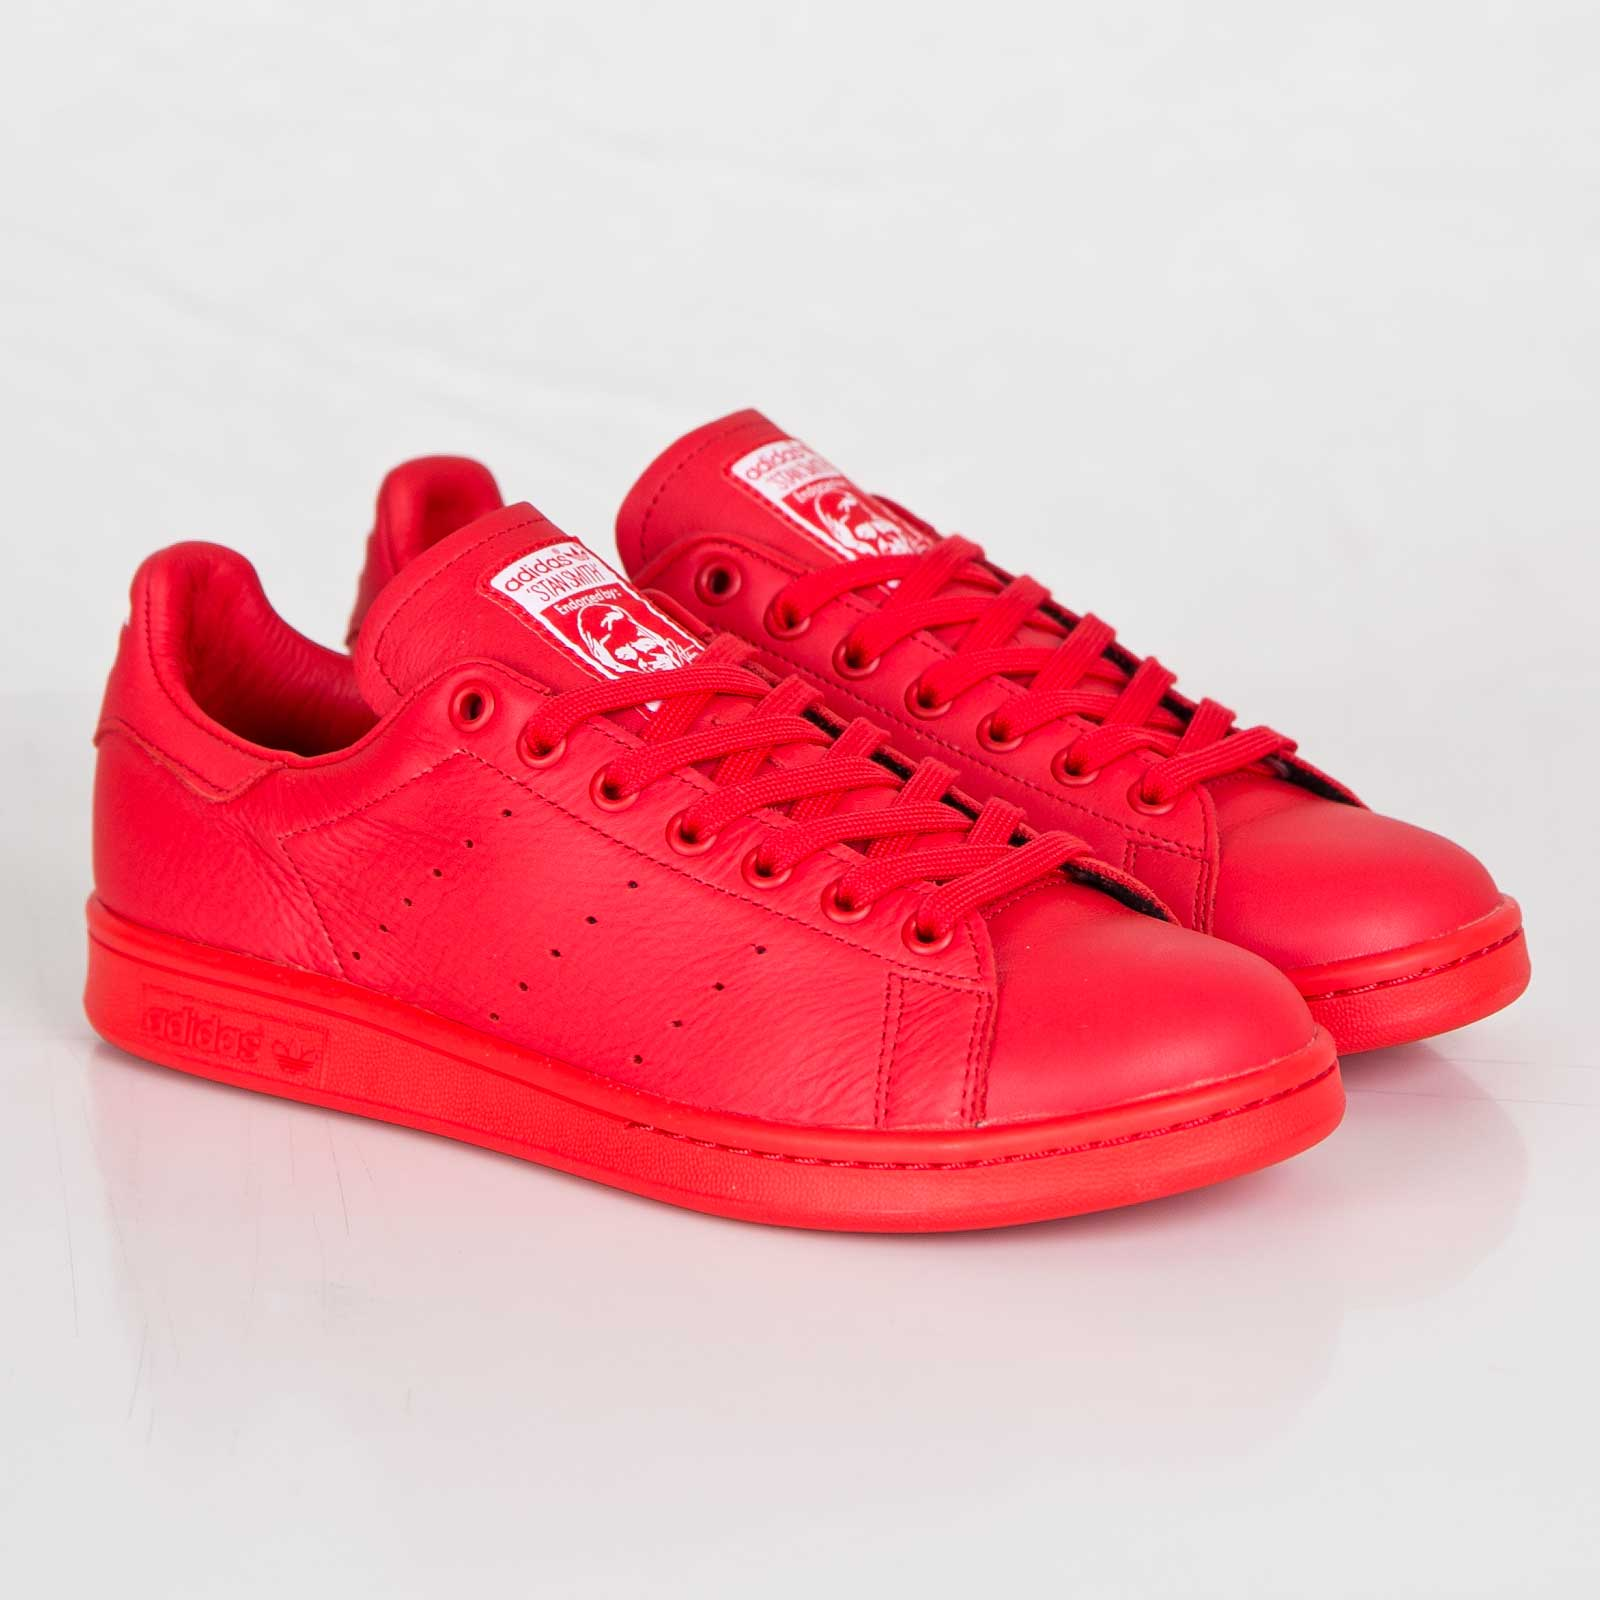 brand new 39063 f9b93 adidas PW Stan Smith SLD - B25385 - Sneakersnstuff ...